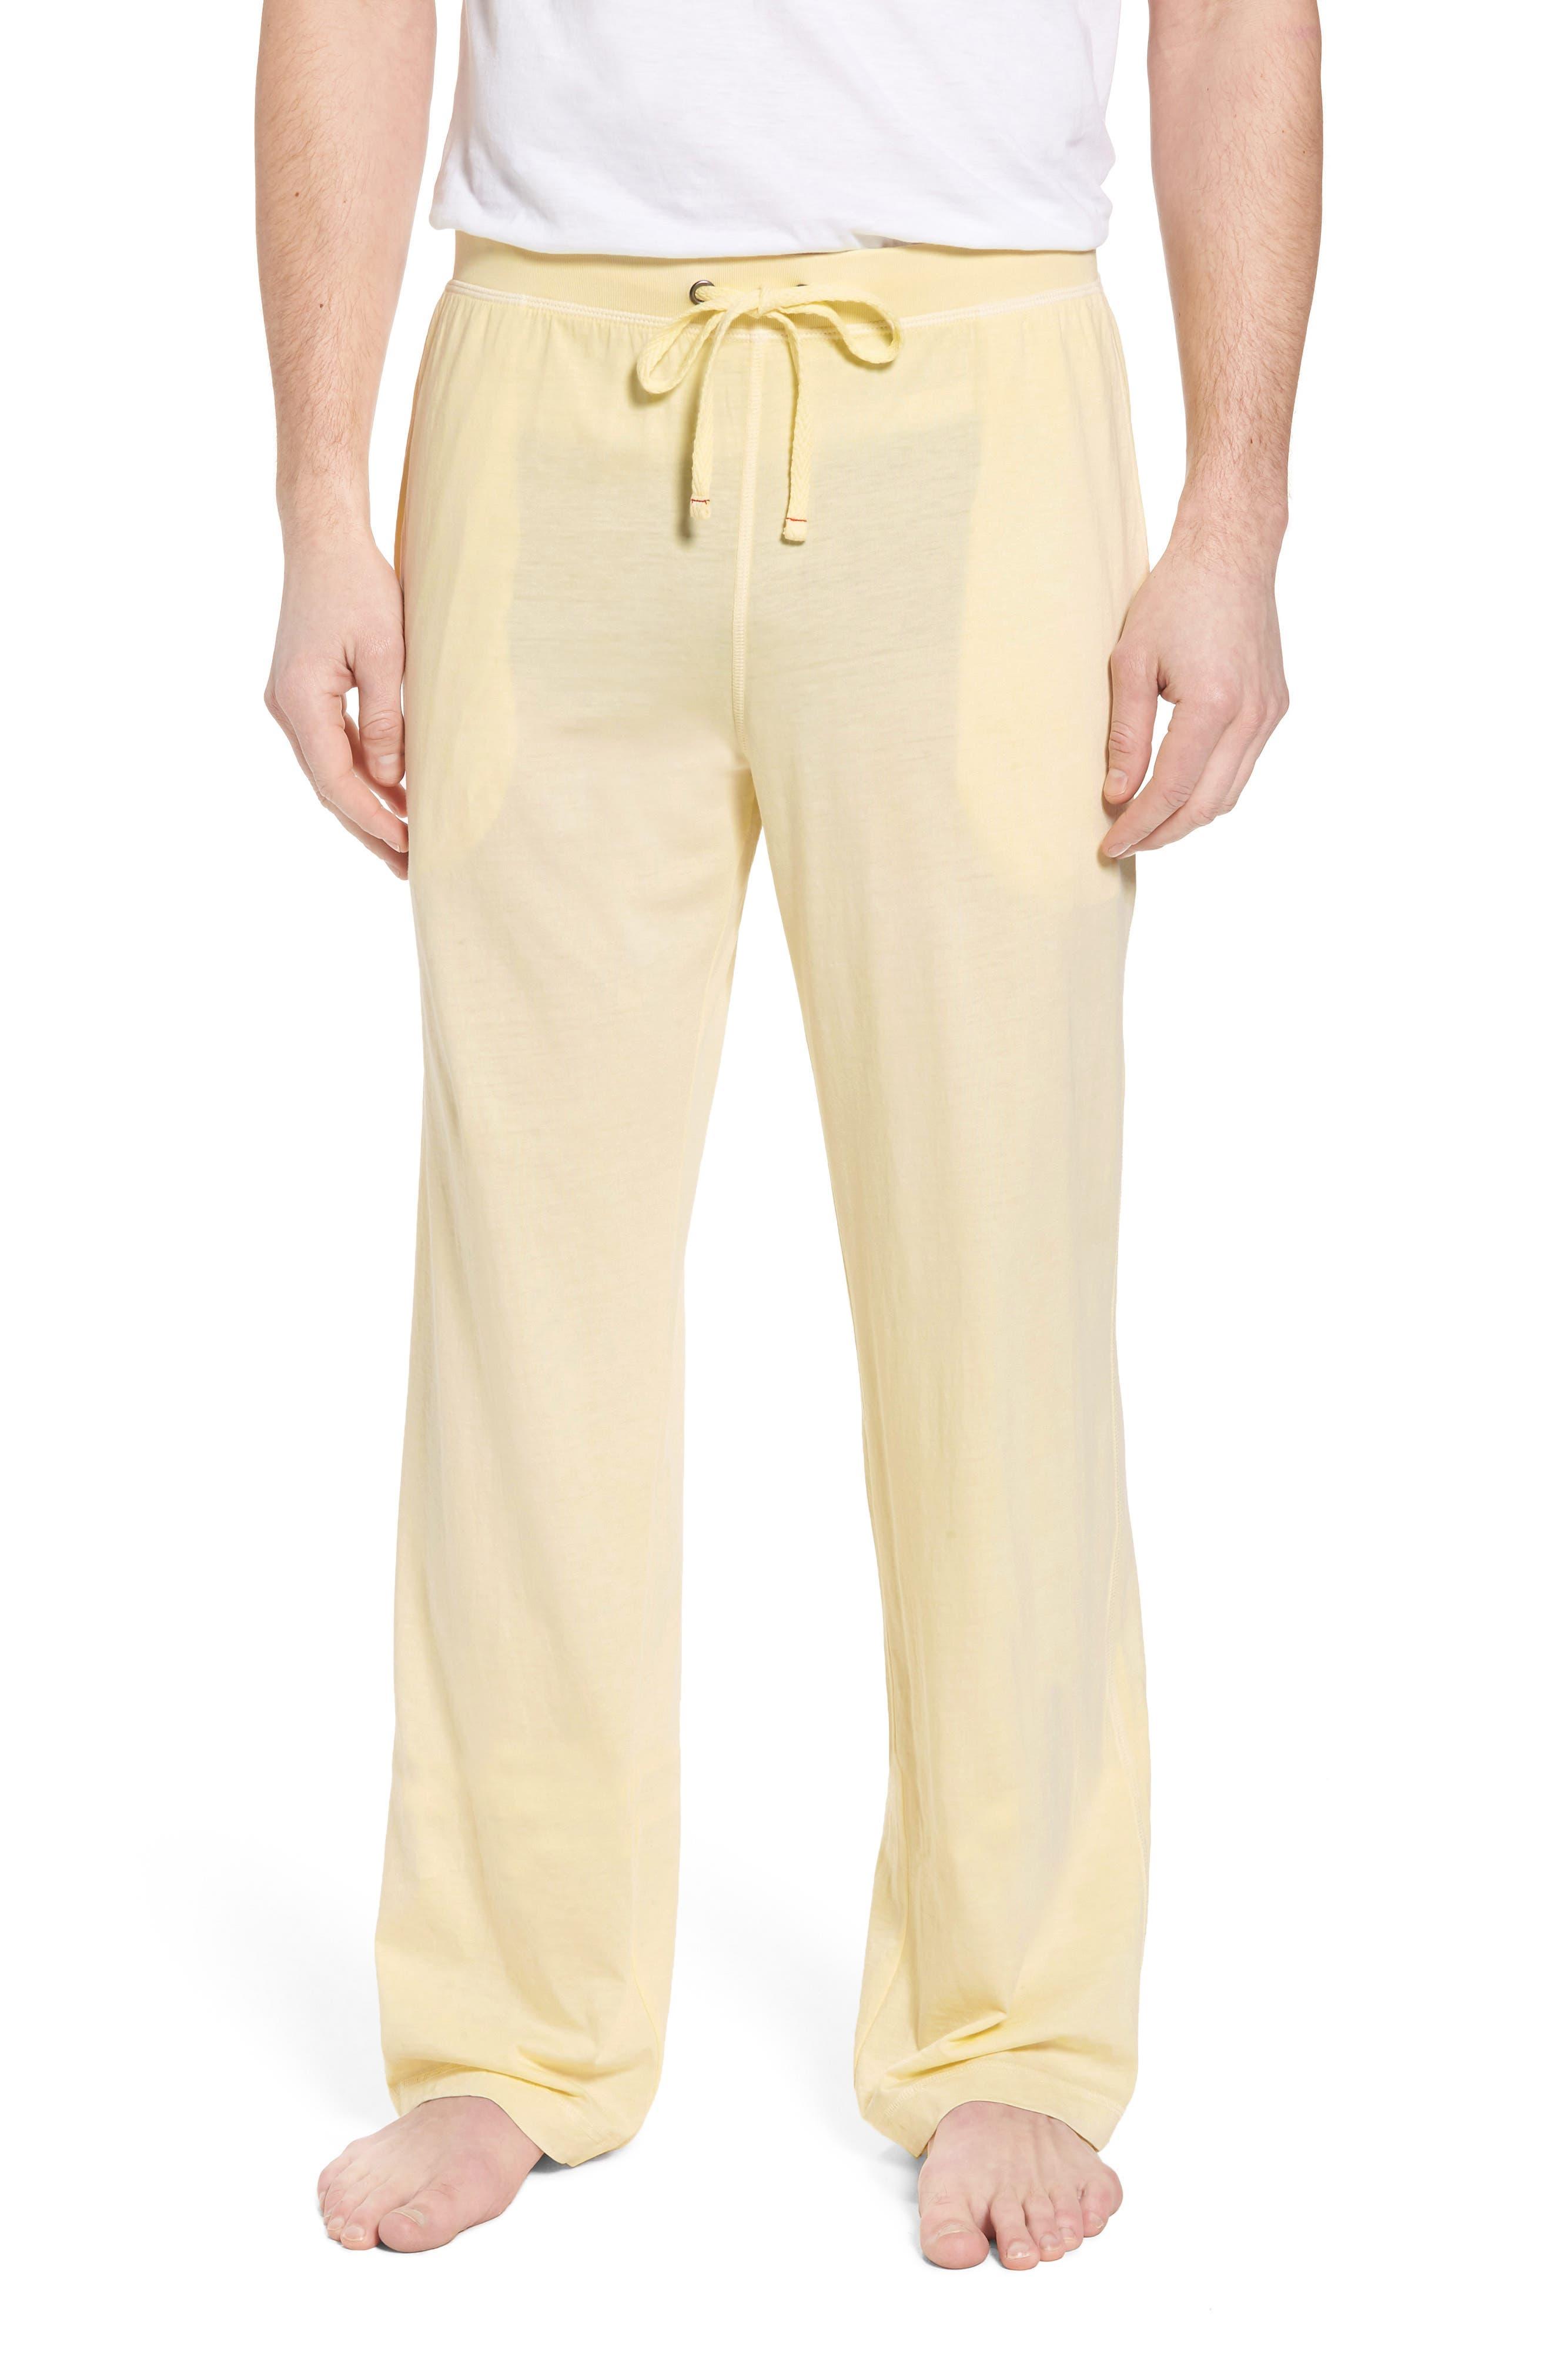 Peruvian Pima Cotton Lounge Pants,                             Main thumbnail 1, color,                             YELLOW